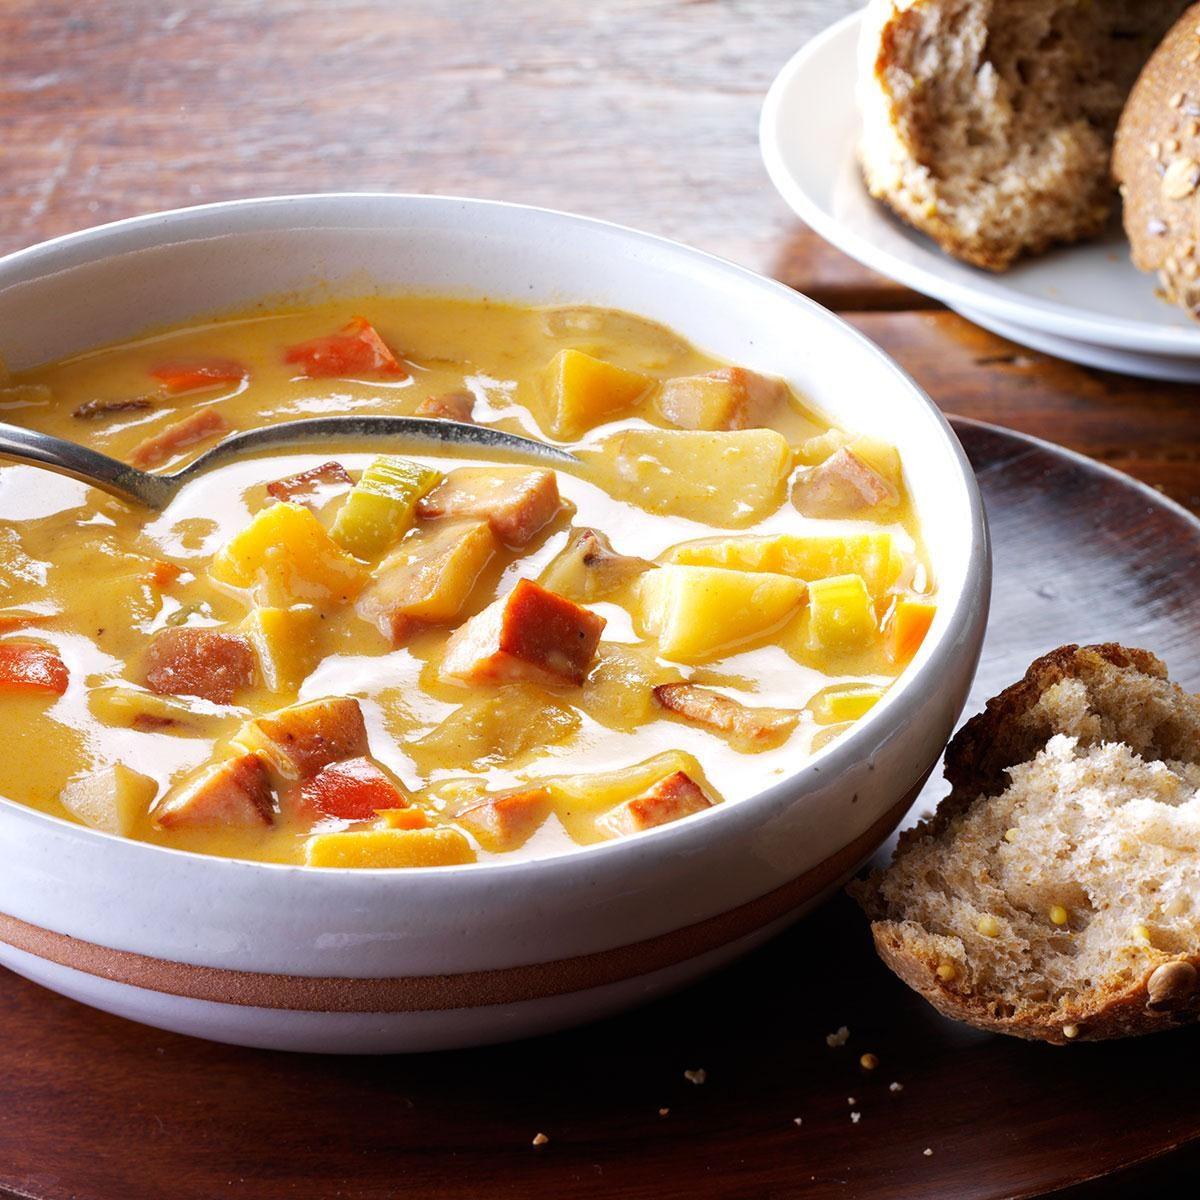 North Carolina: Ham & Potato-Rutabaga Chowder